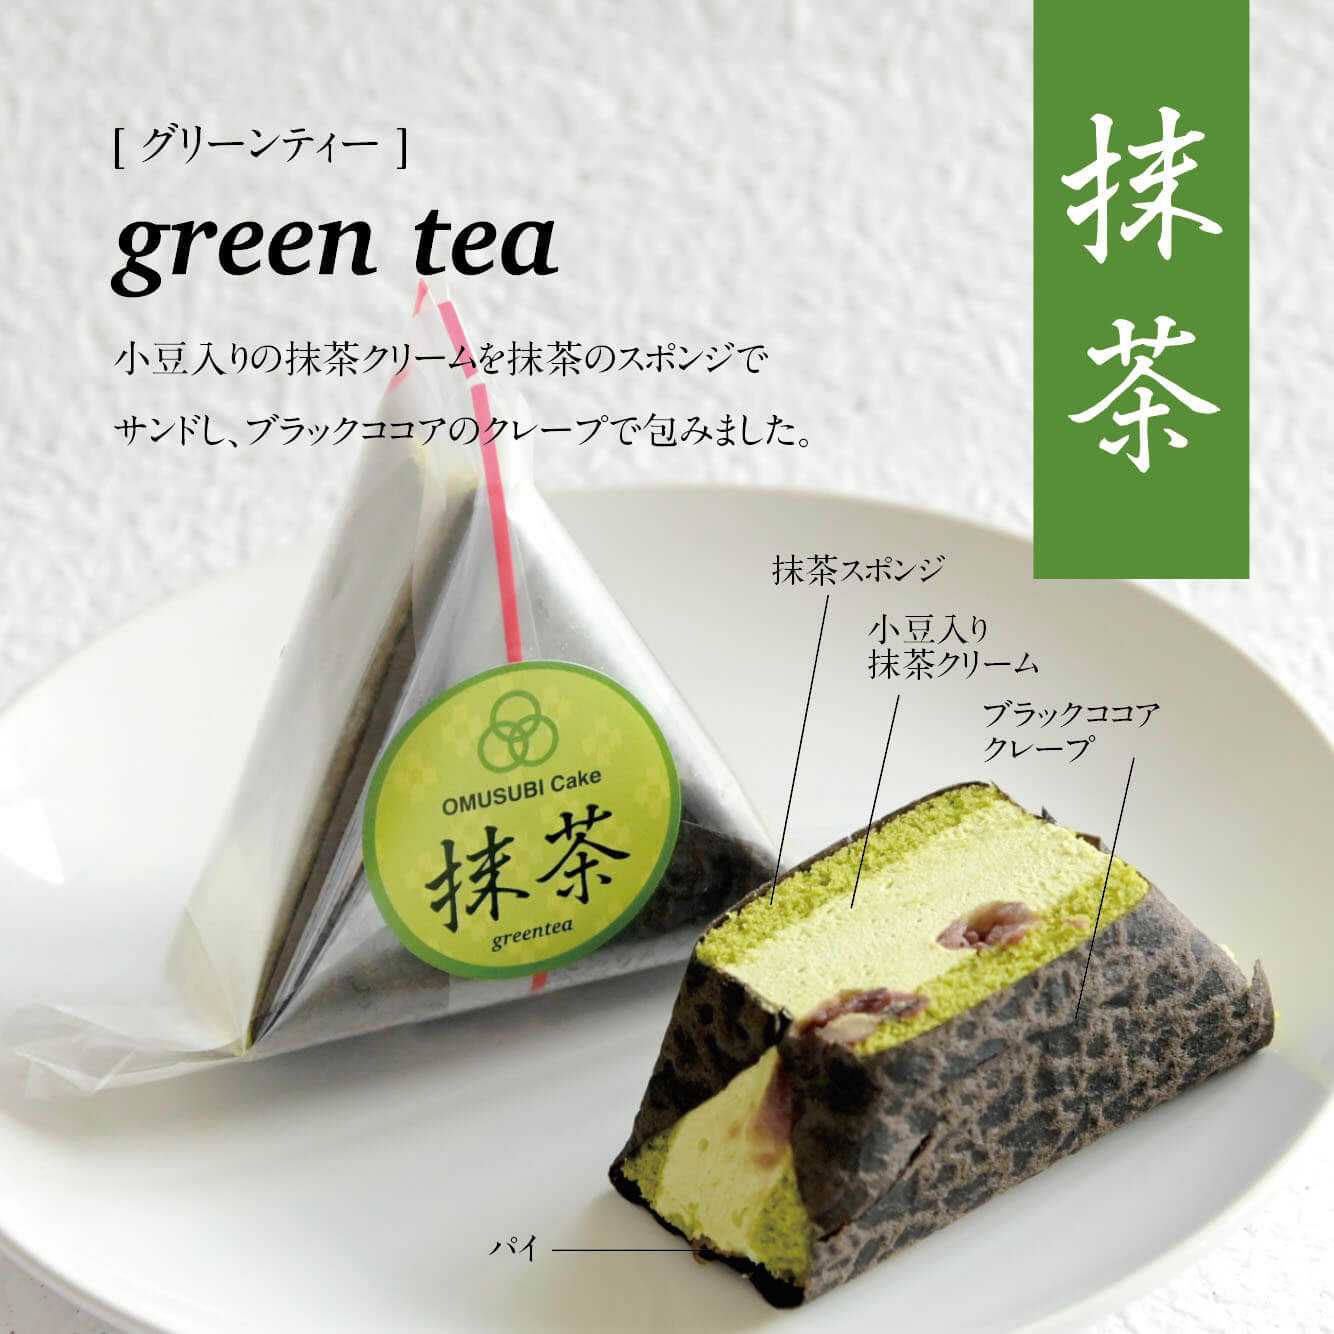 OMUSUBI Cake(おむすびケーキ)の『抹茶』